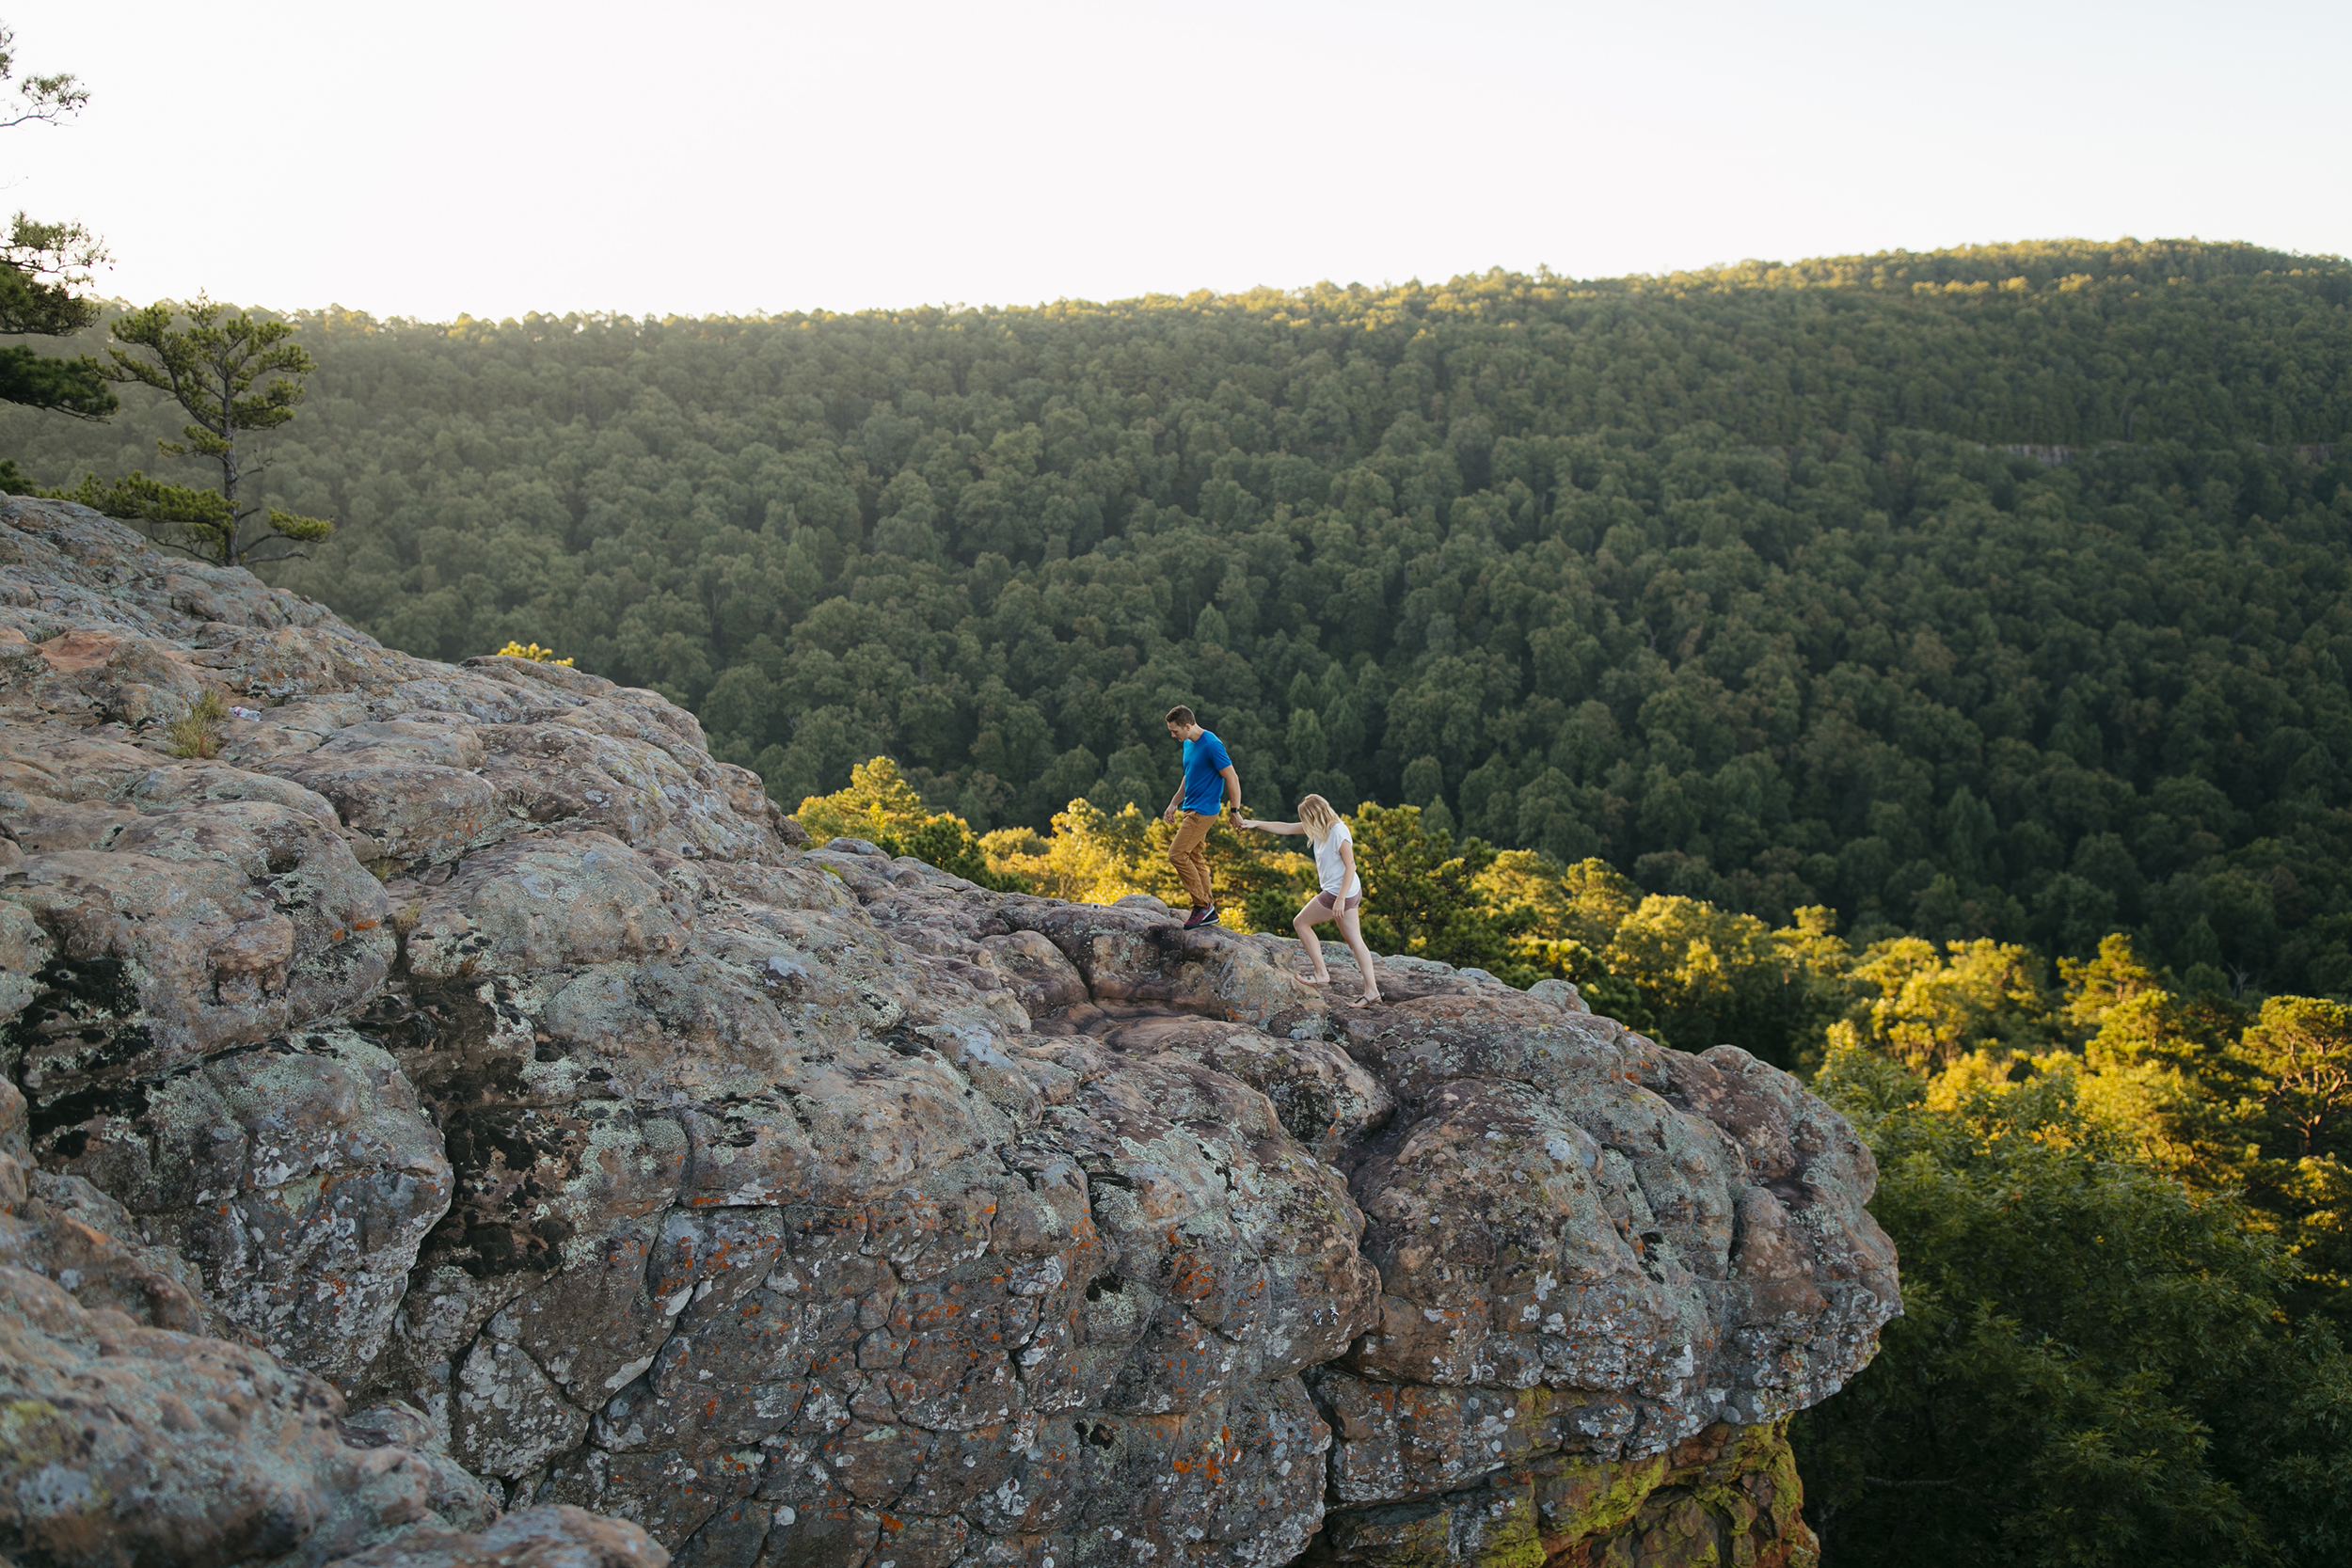 Buffalo-River-Arkansas-Sams-Throne-Adventure-Engagement-Photographer53.JPG